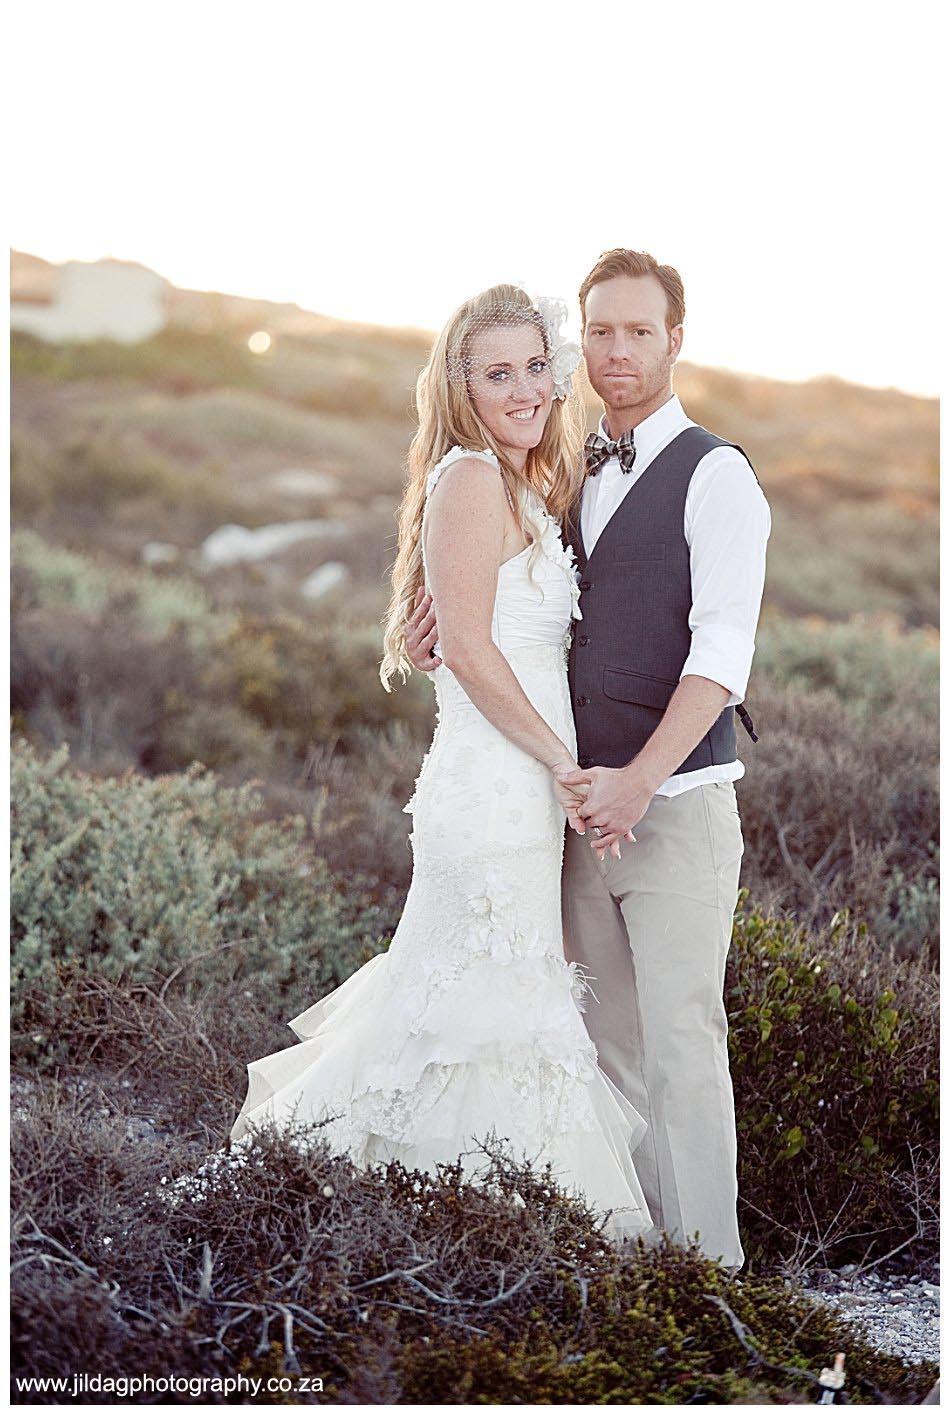 Seatrader, West coast beach wedding, Romy & Clynt (46)